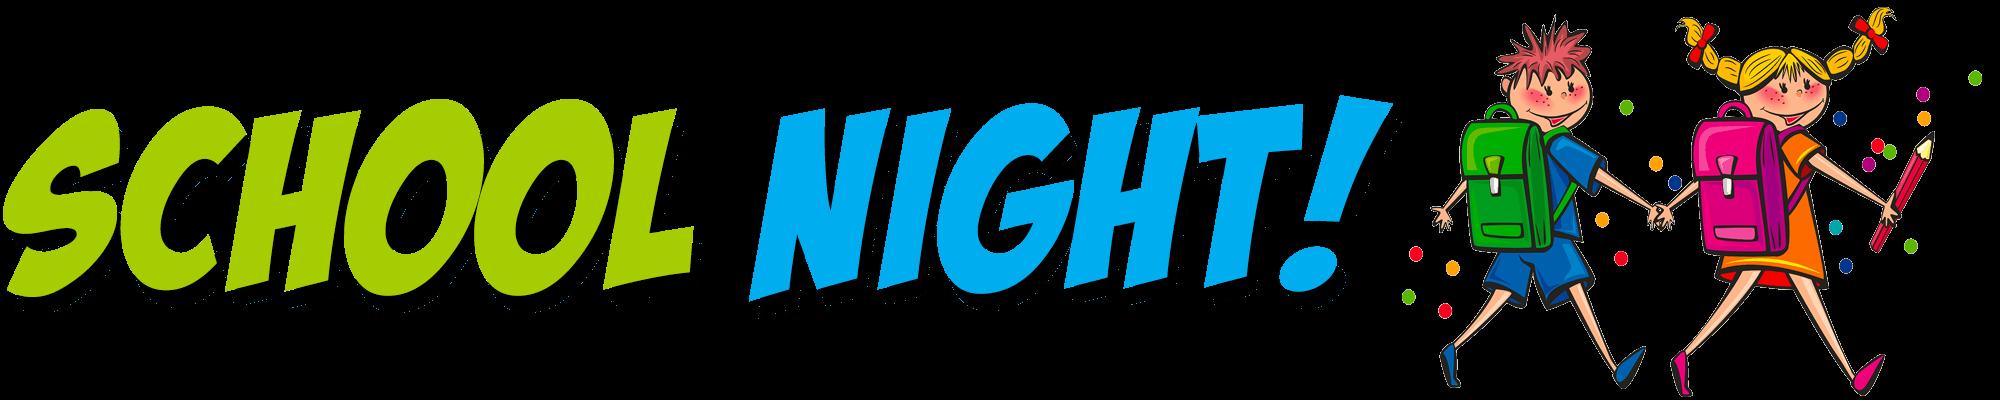 SchoolNight-header_2000x400.png